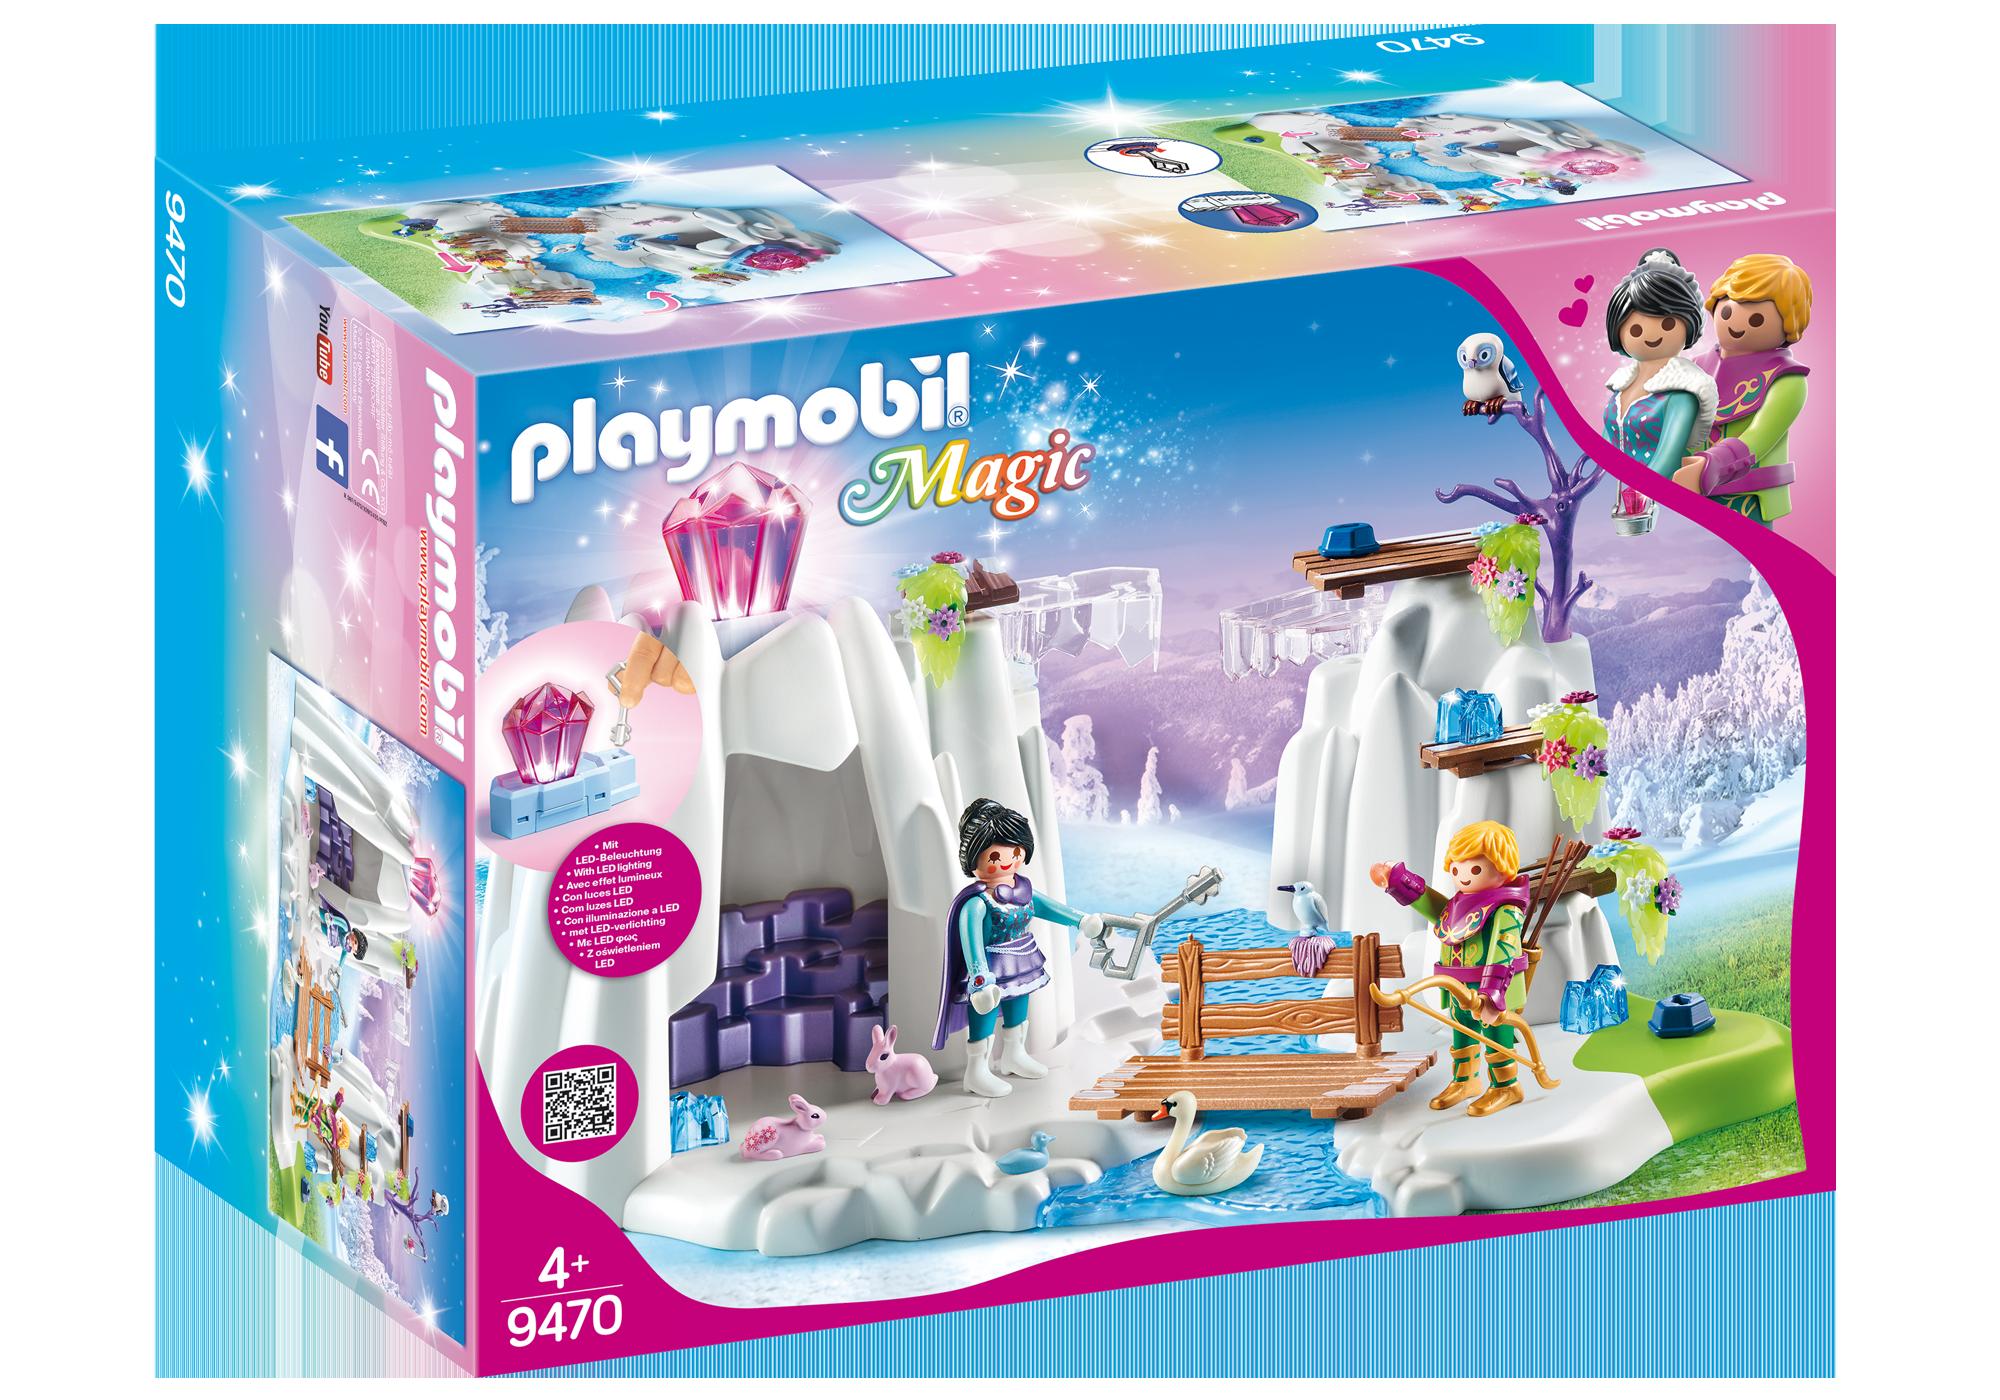 http://media.playmobil.com/i/playmobil/9470_product_box_front/Søg efter kærlighedskrystaldiamanten